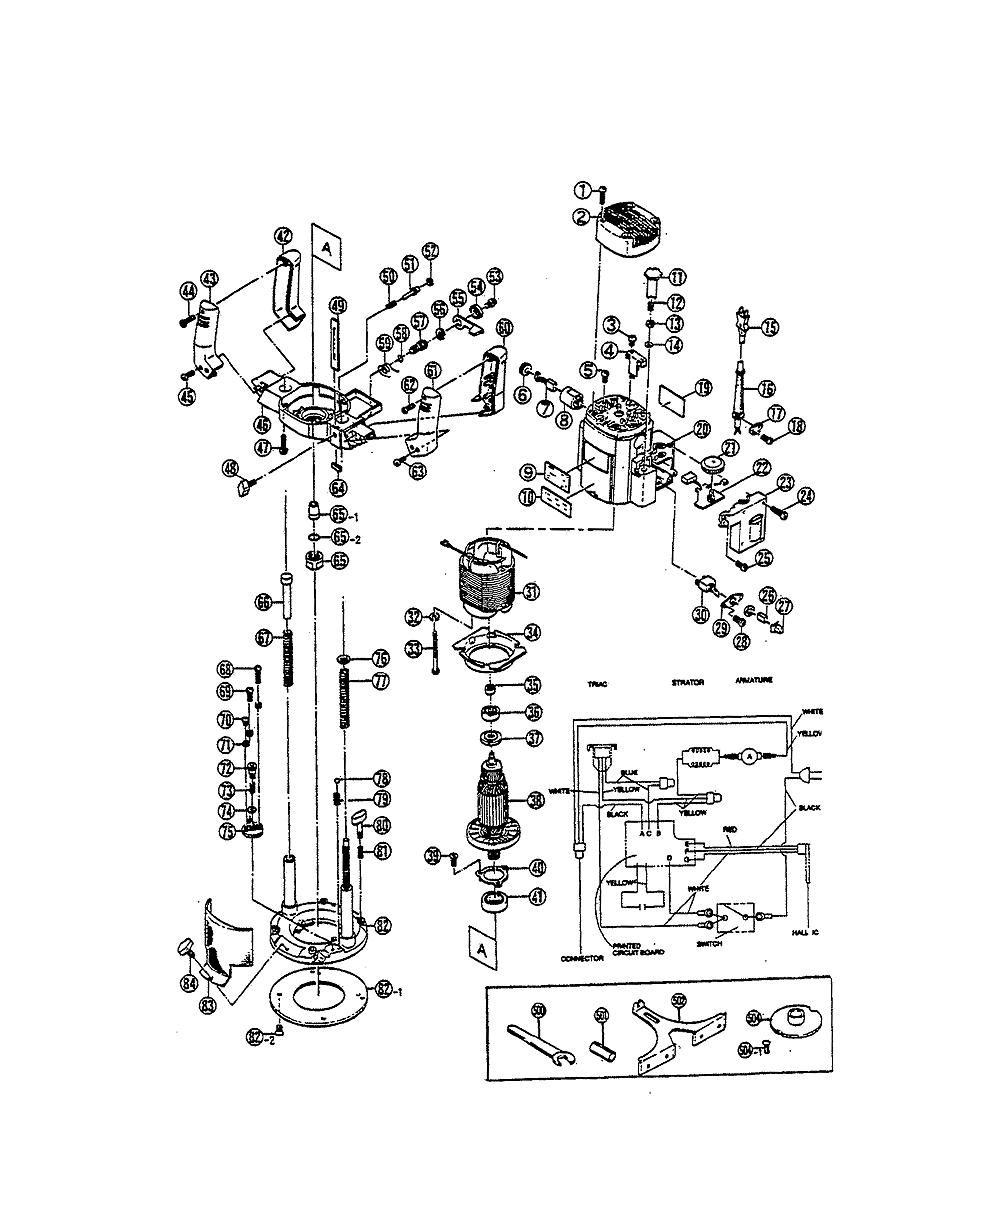 buy ryobi re600 replacement tool parts | ryobi re600 ... ryobi router wiring diagram att router wiring diagram #13